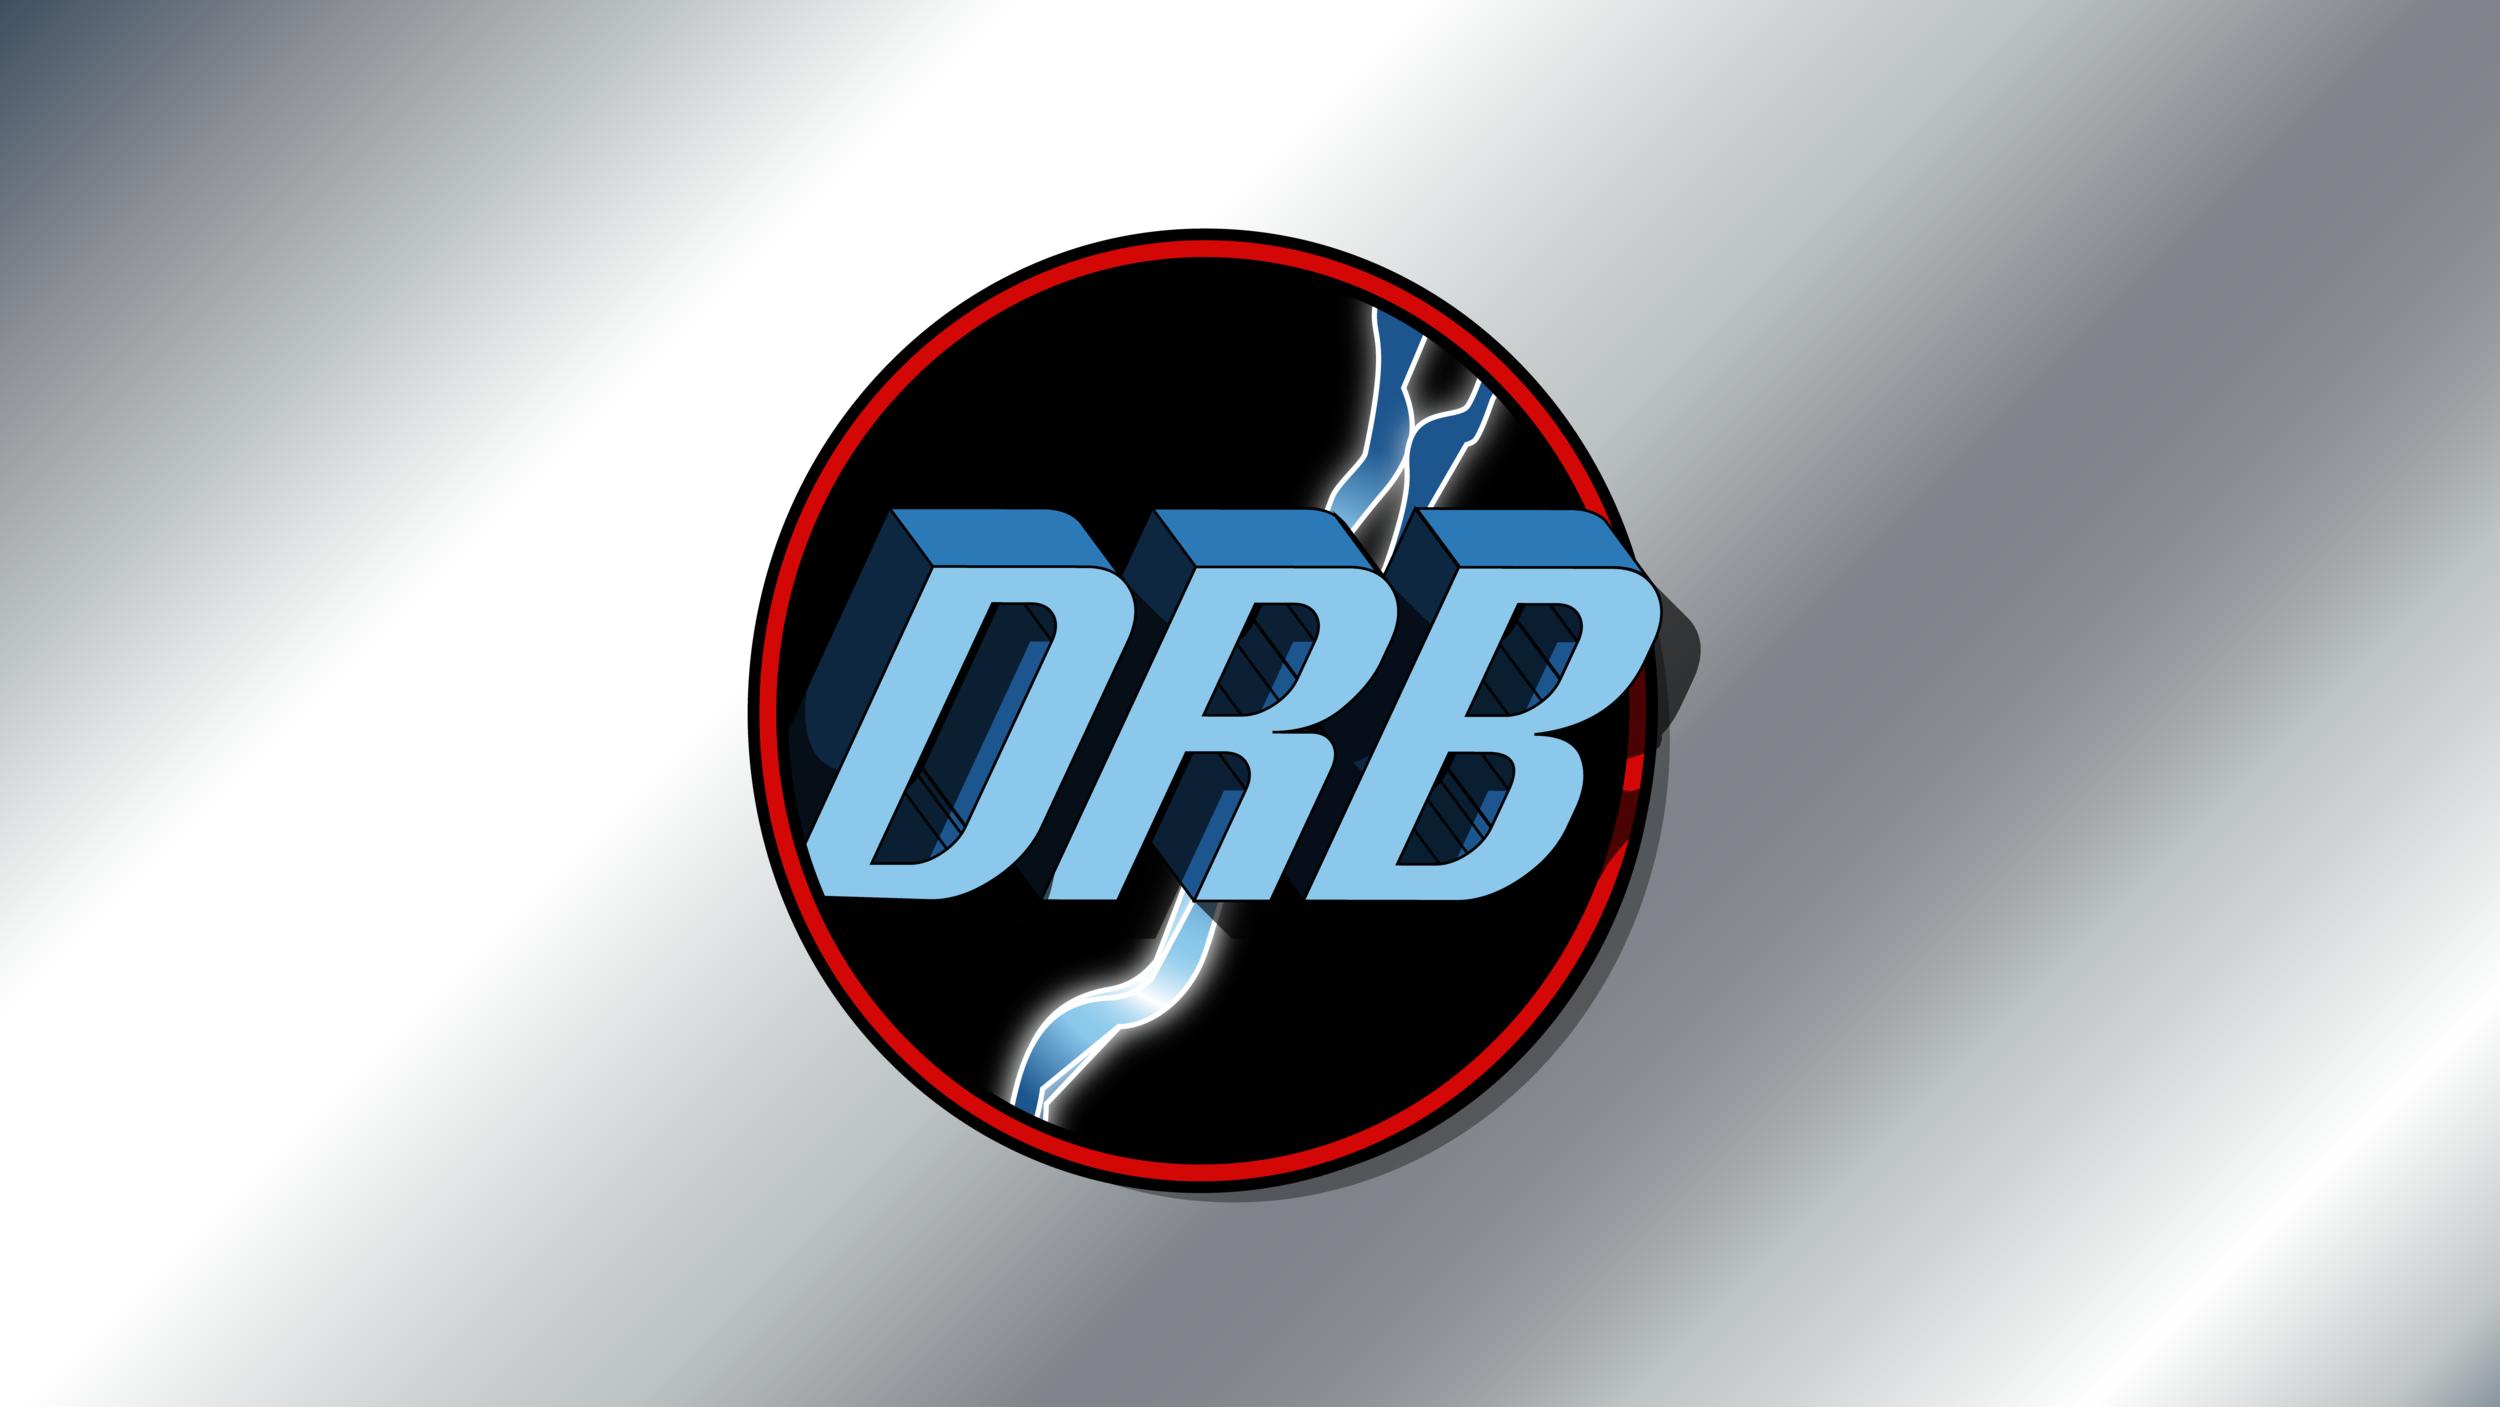 DRB_T2-06.png